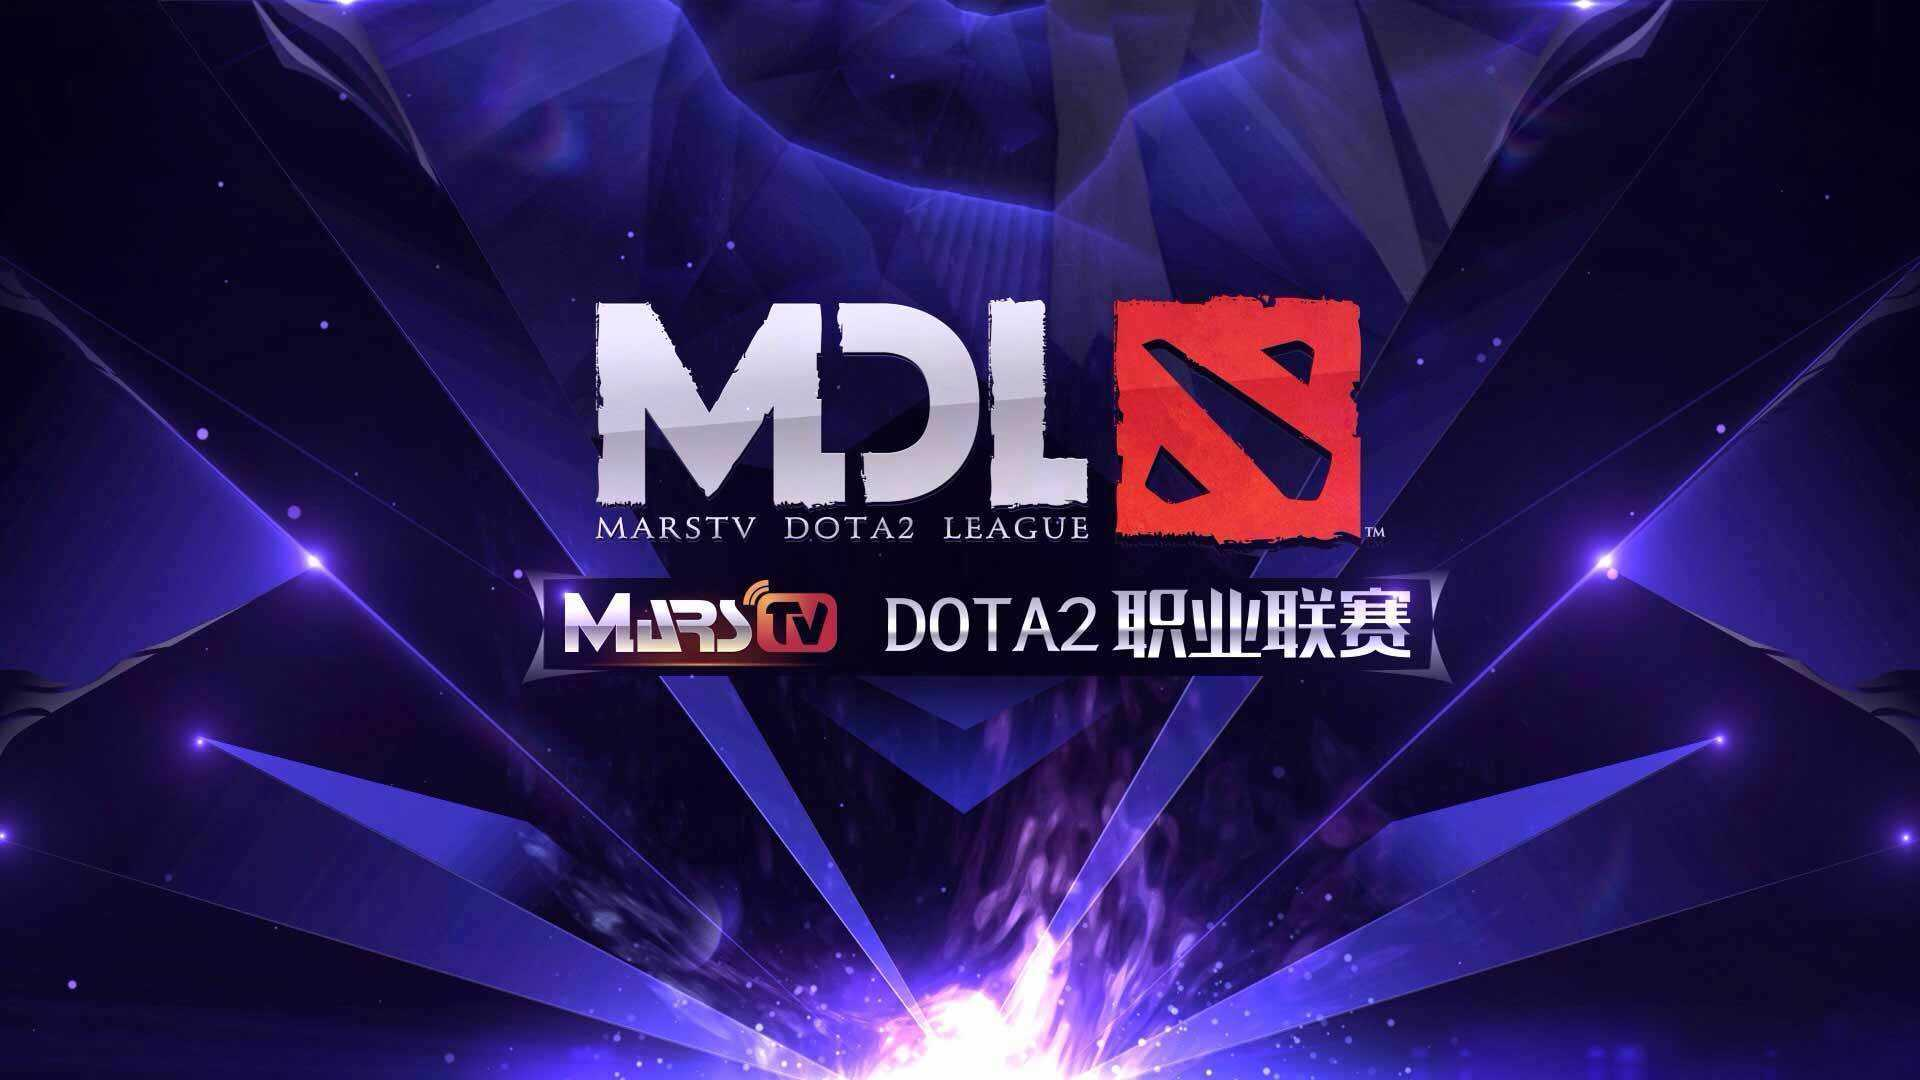 MarsTV Dota 2 League, Evil Geniuses, Vici Gaming, OG, Newbee, Team Secret, Team Spirit, Complexity, Mineski, EHOME, PSG.LGD